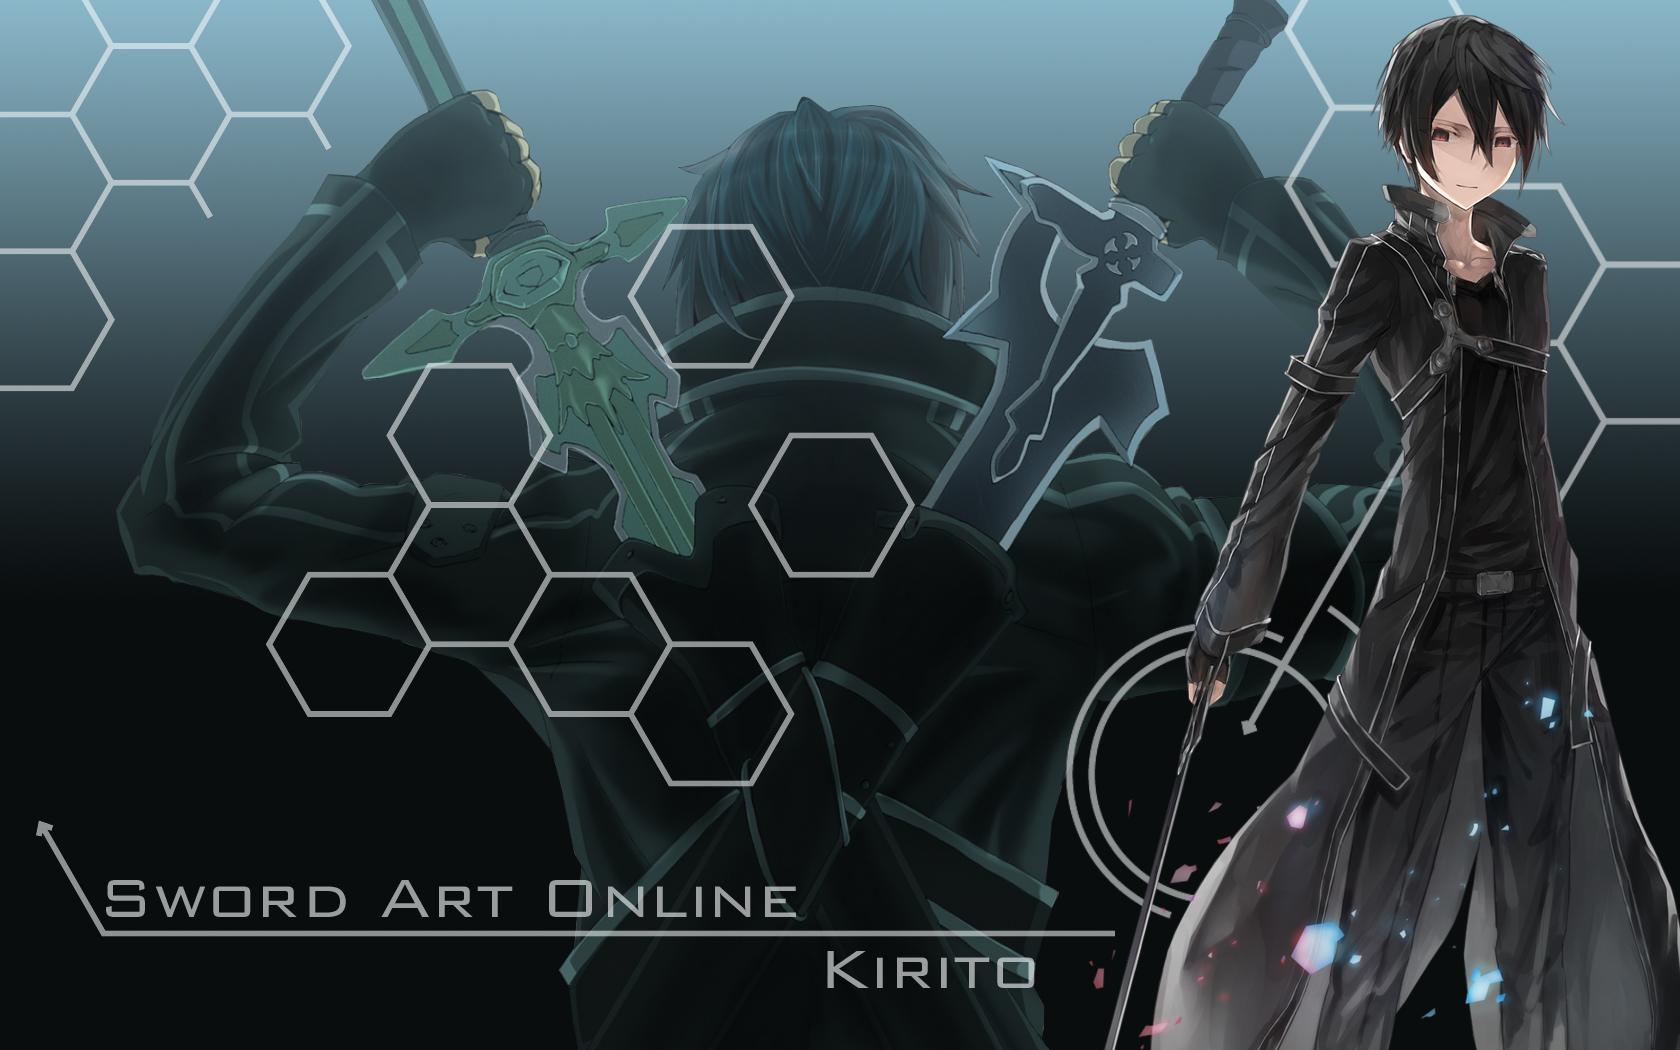 sword_art_online___kirito_wallpaper_by_y